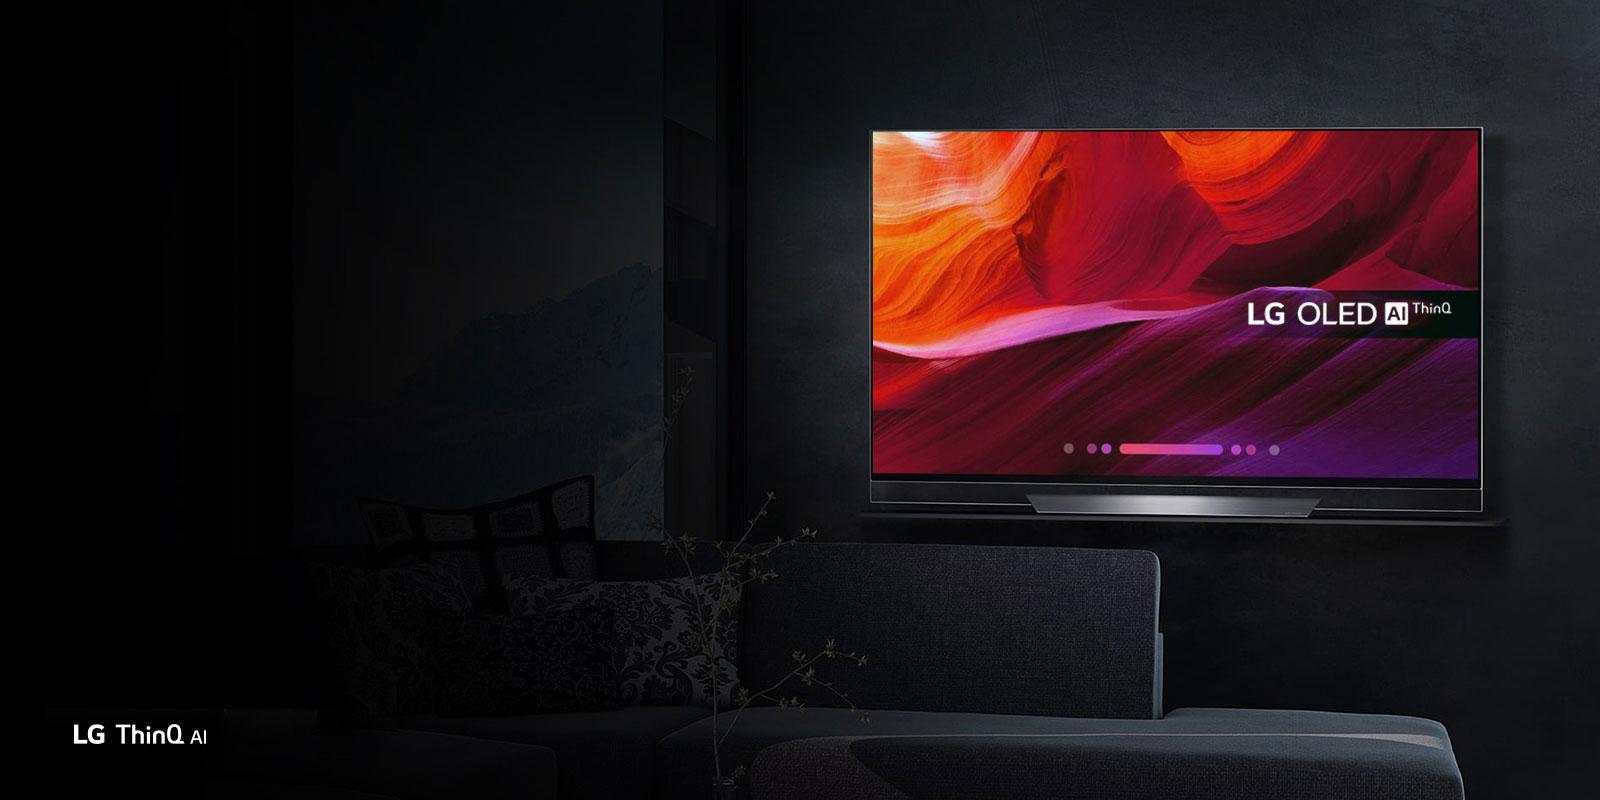 LG: SmartPhones, TVs & Entertainment, Home Appliances | LG UAE